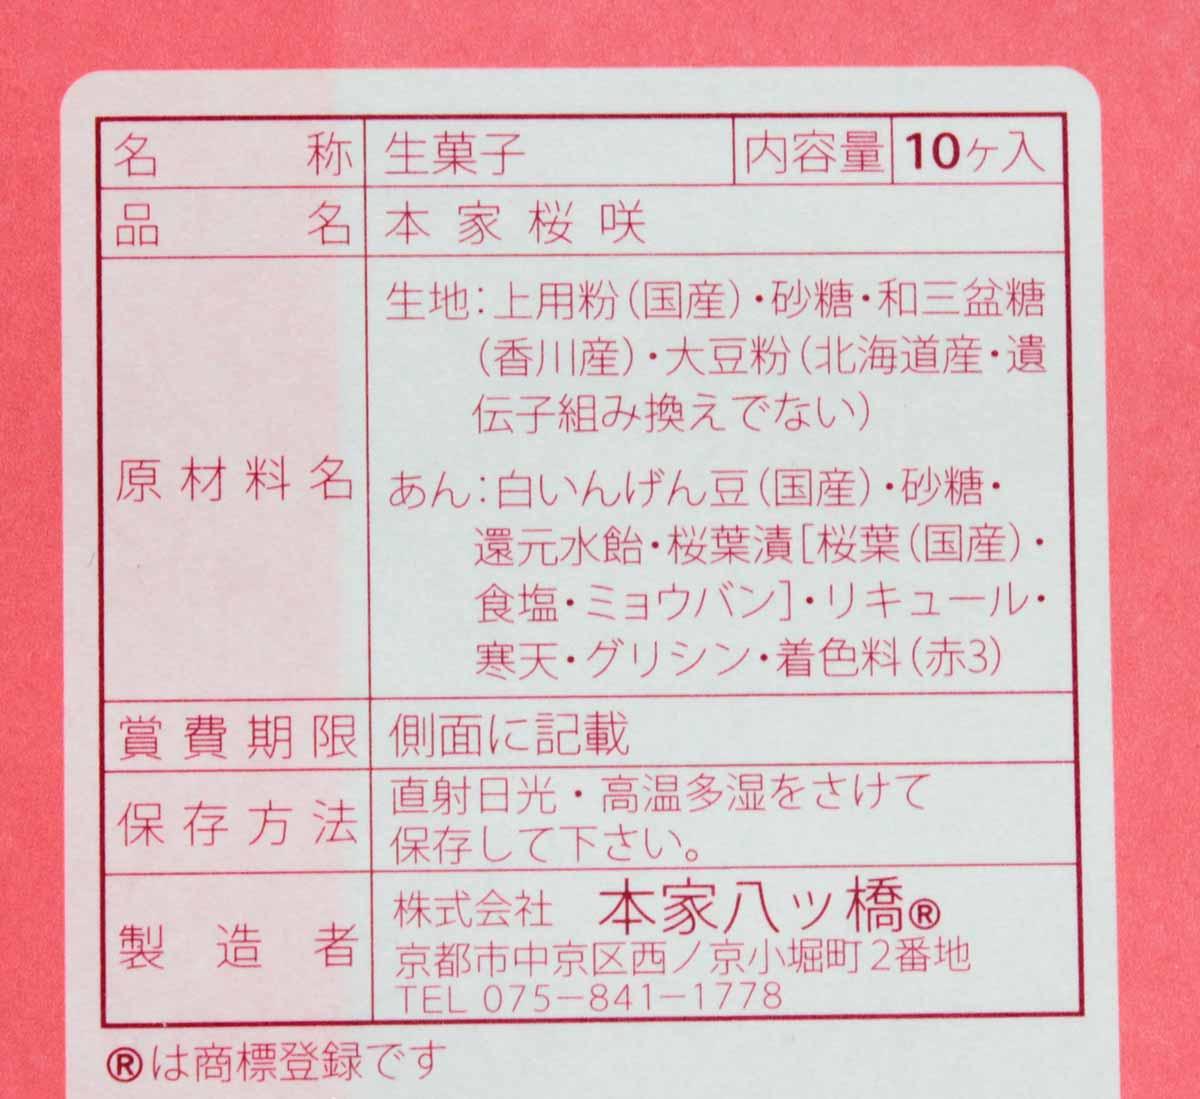 本家桜咲の食品表示